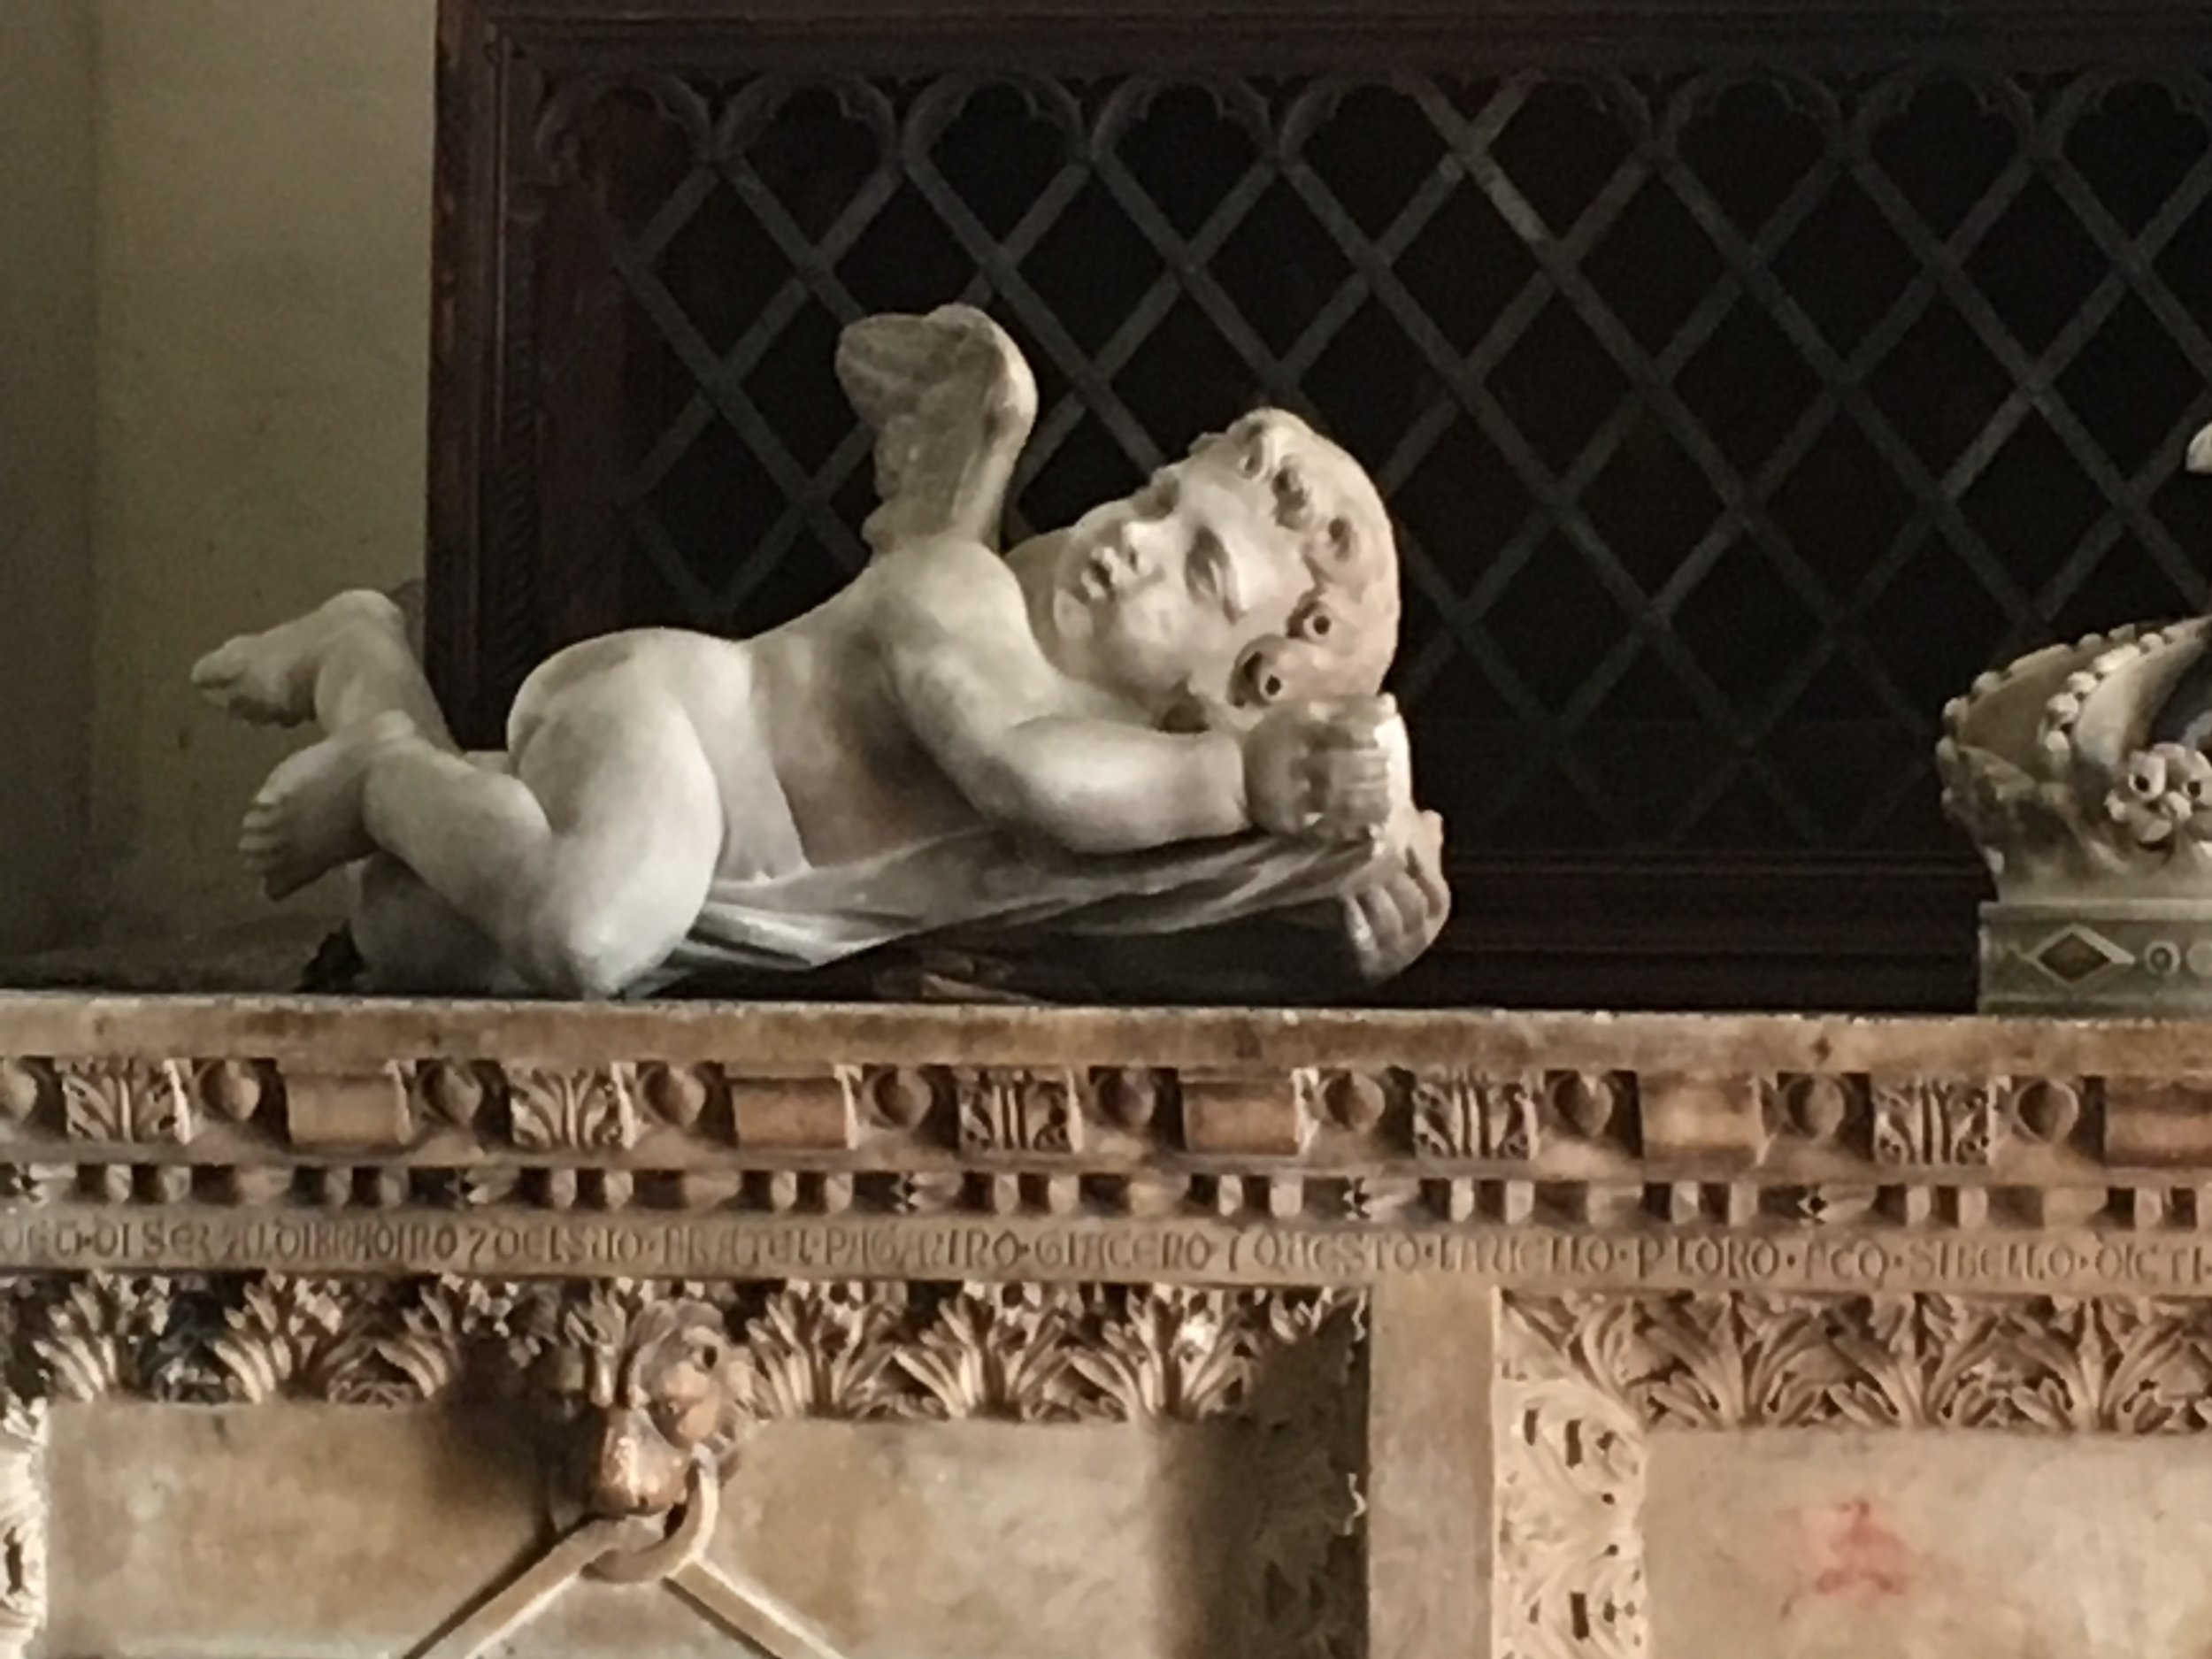 Putto (cherub), church of San Frediano, Lucca, Italy